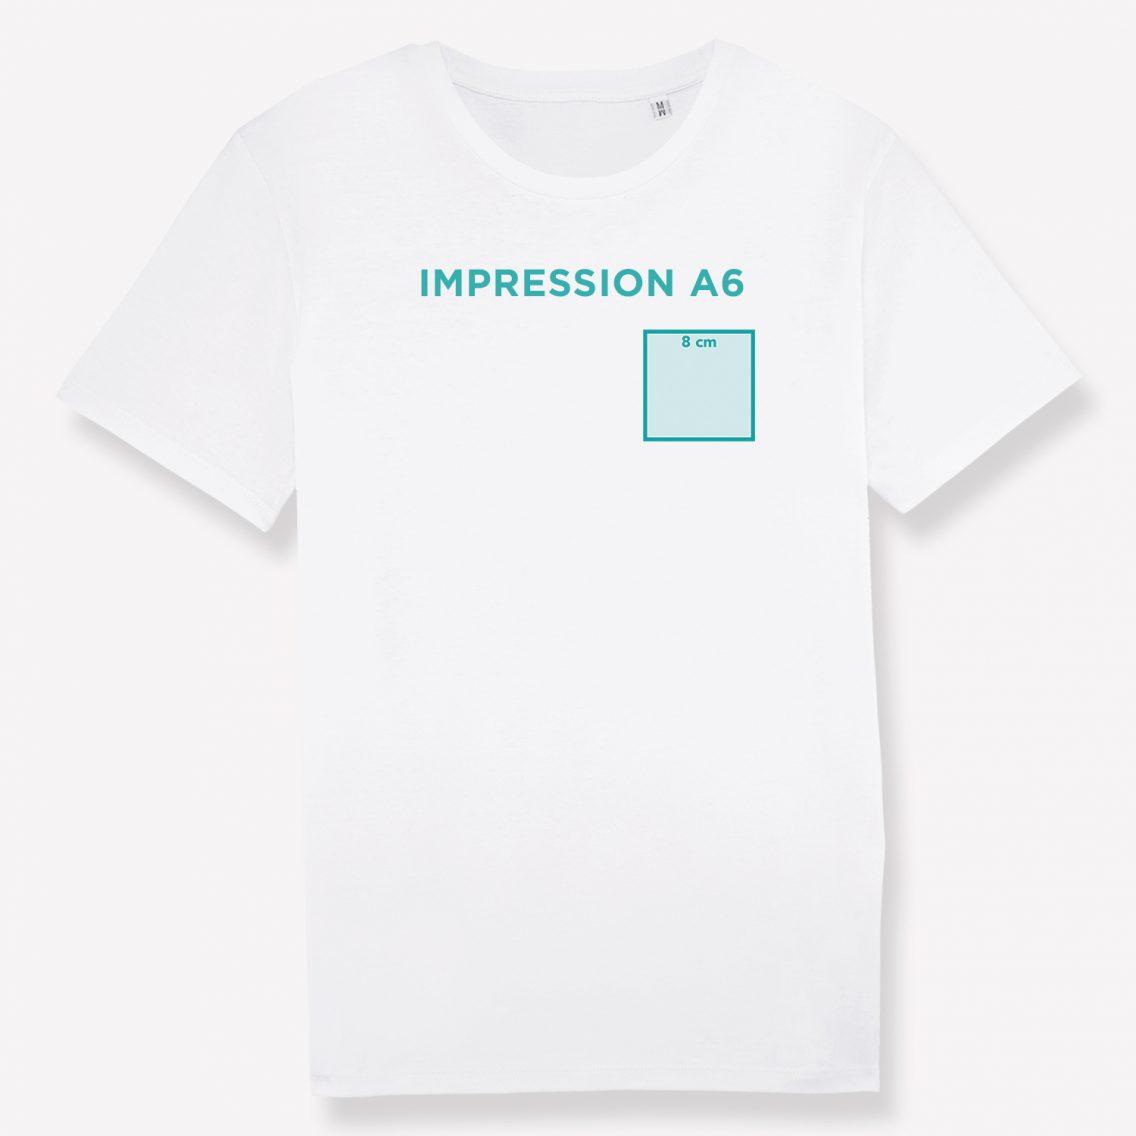 Impression A6